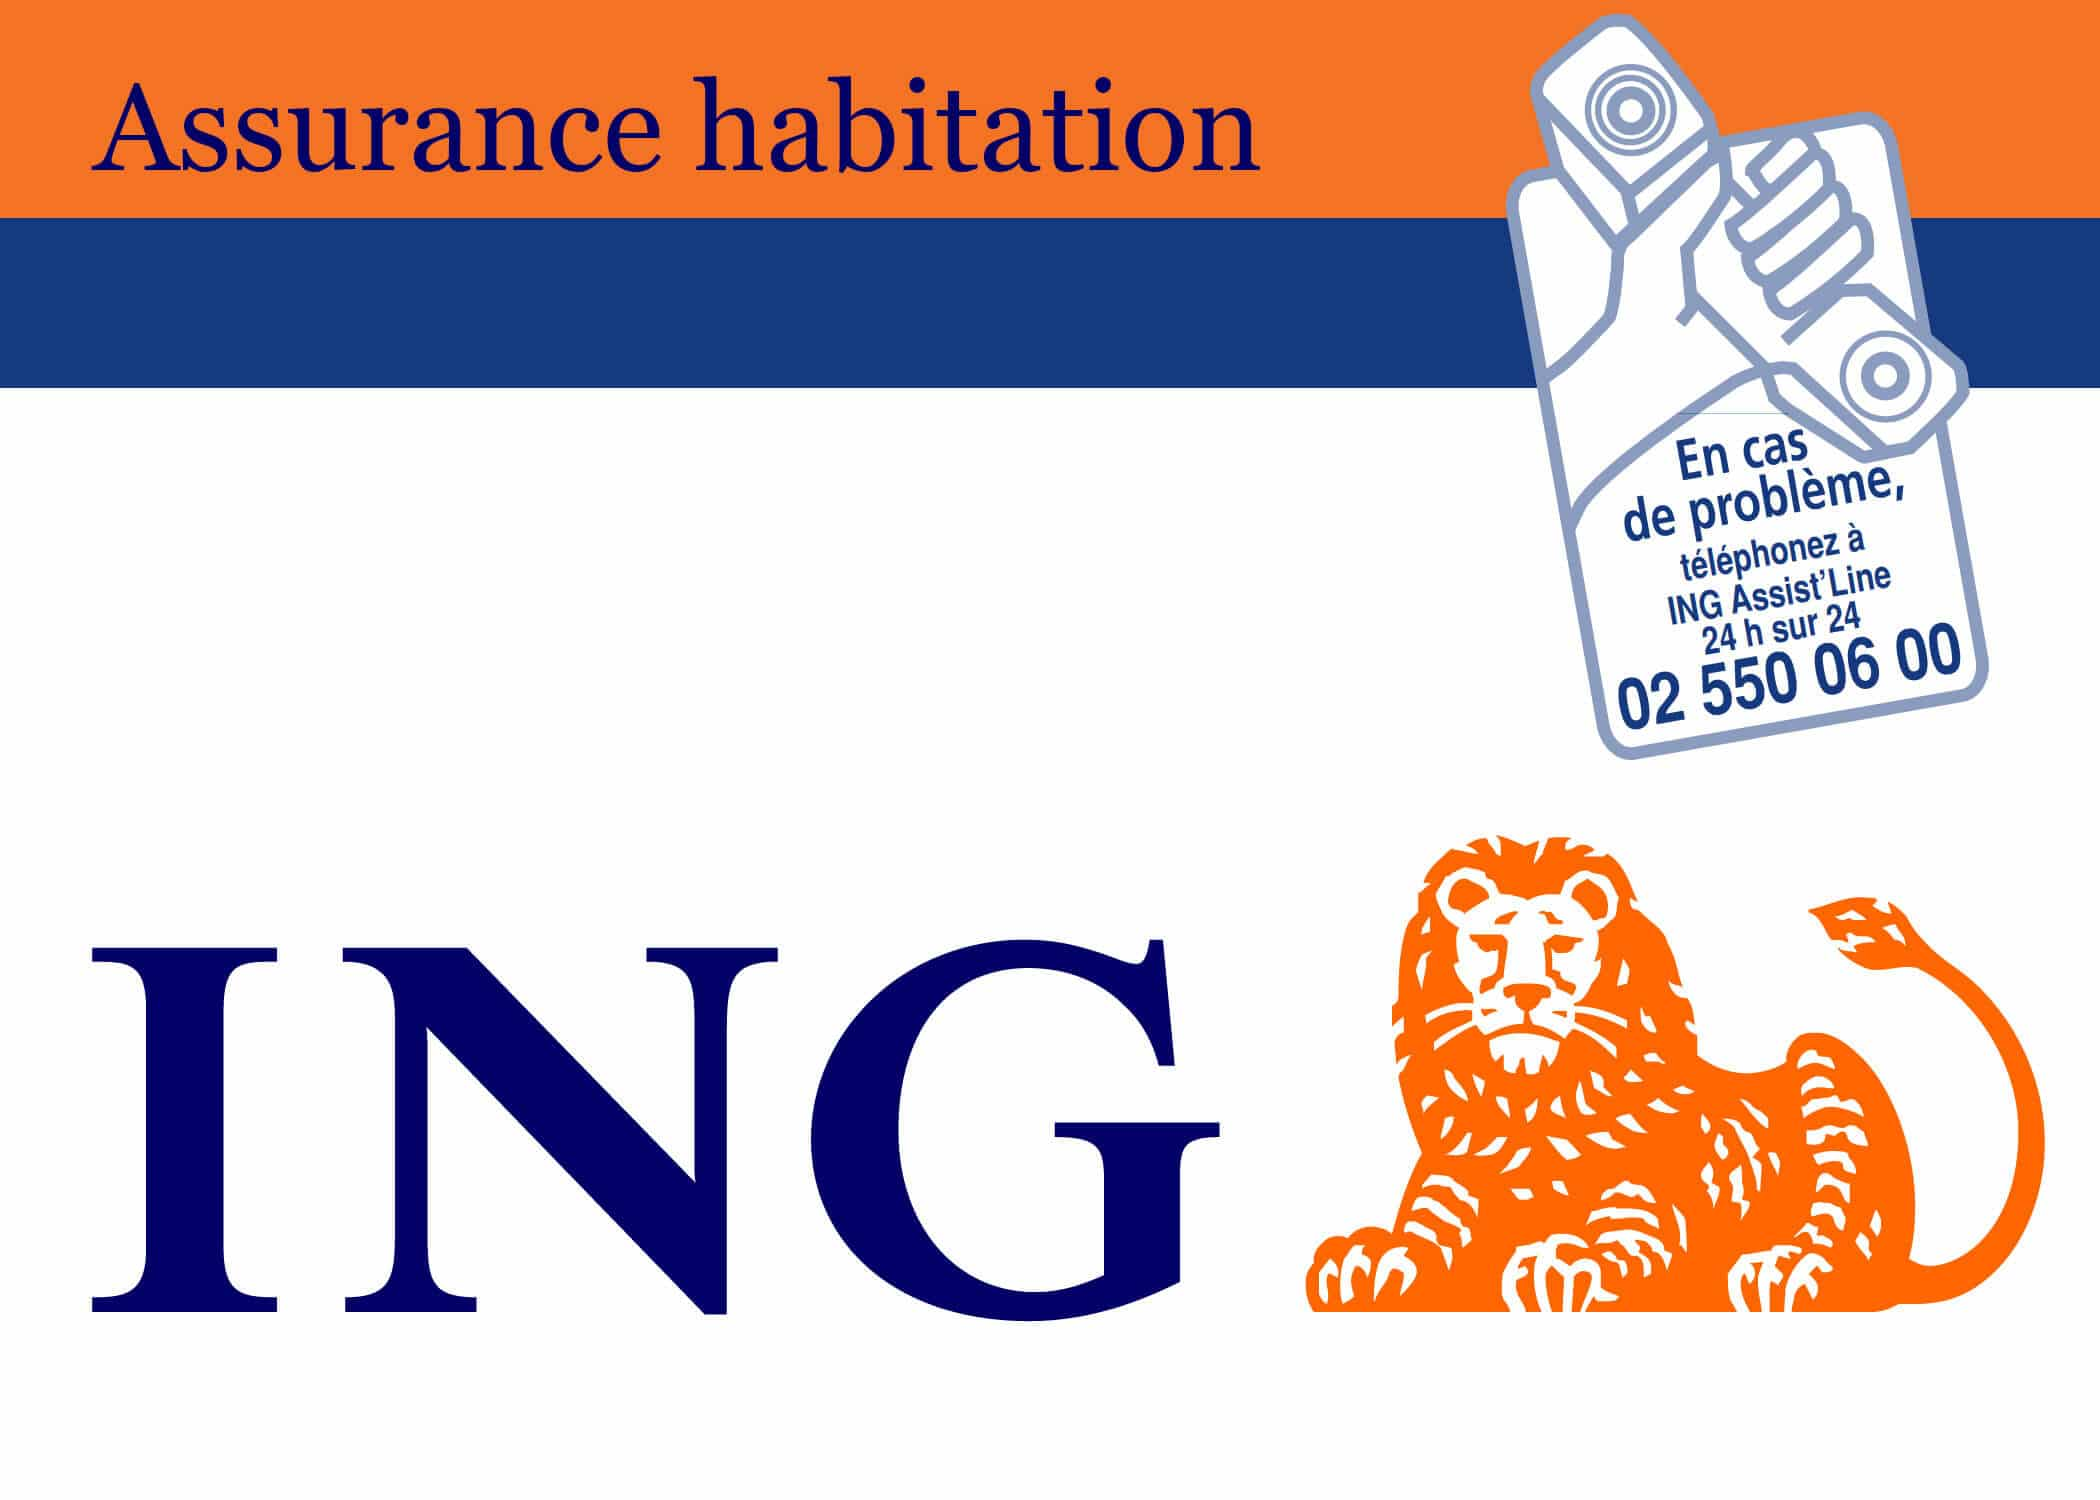 ING assurance habitation